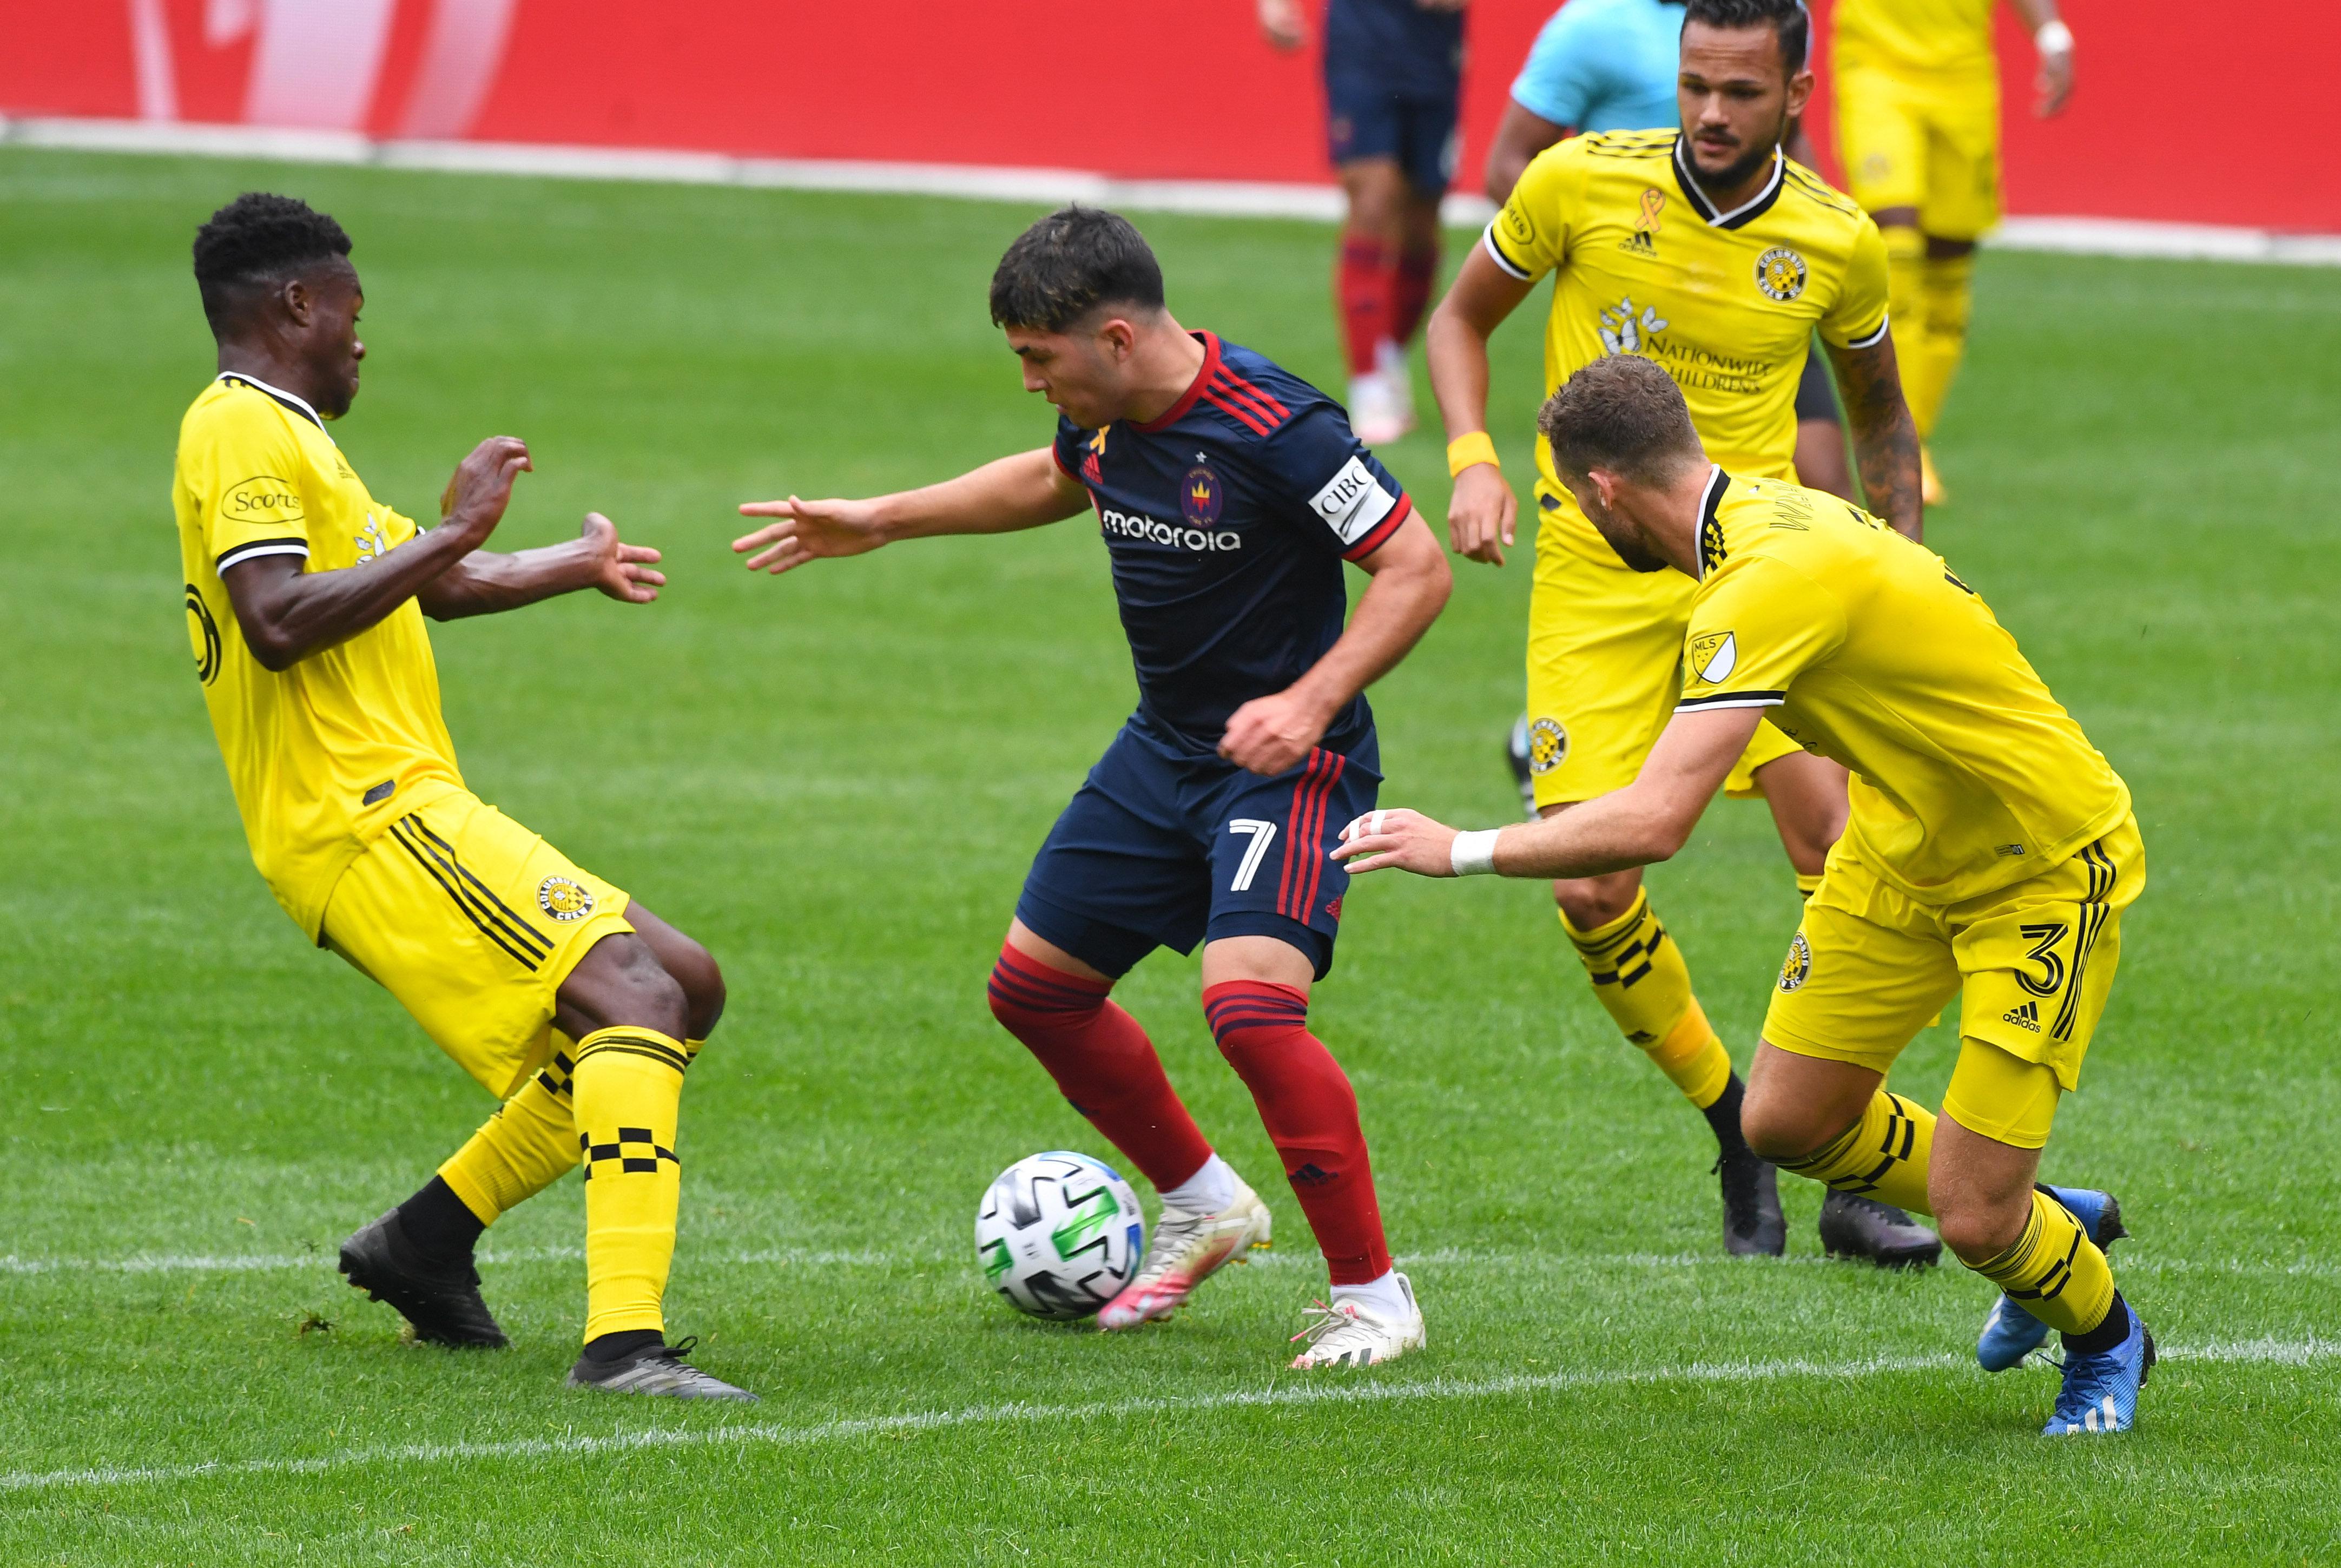 Chicago Fire 2, Columbus Crew 2 | 2020 MLS Regular Season Match Recap | MLSSoccer.com